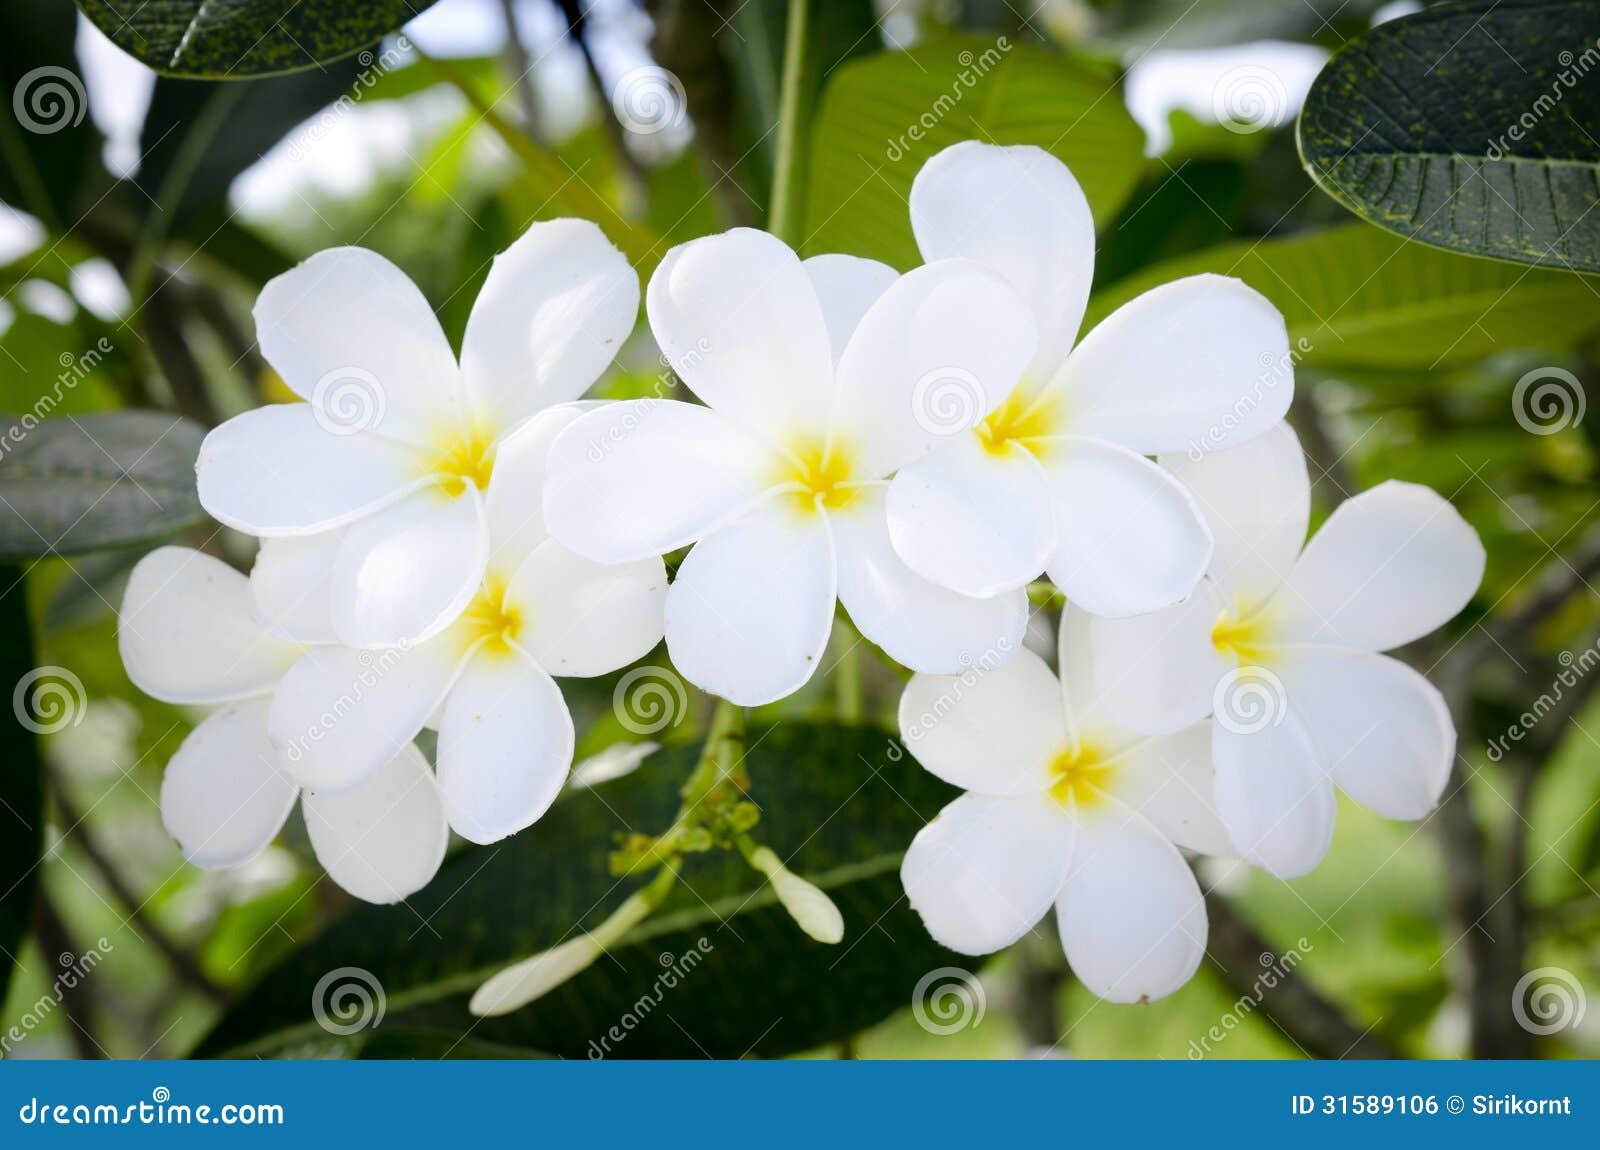 White Tropical Flower Stock Photo Image Of Freshness 31589106